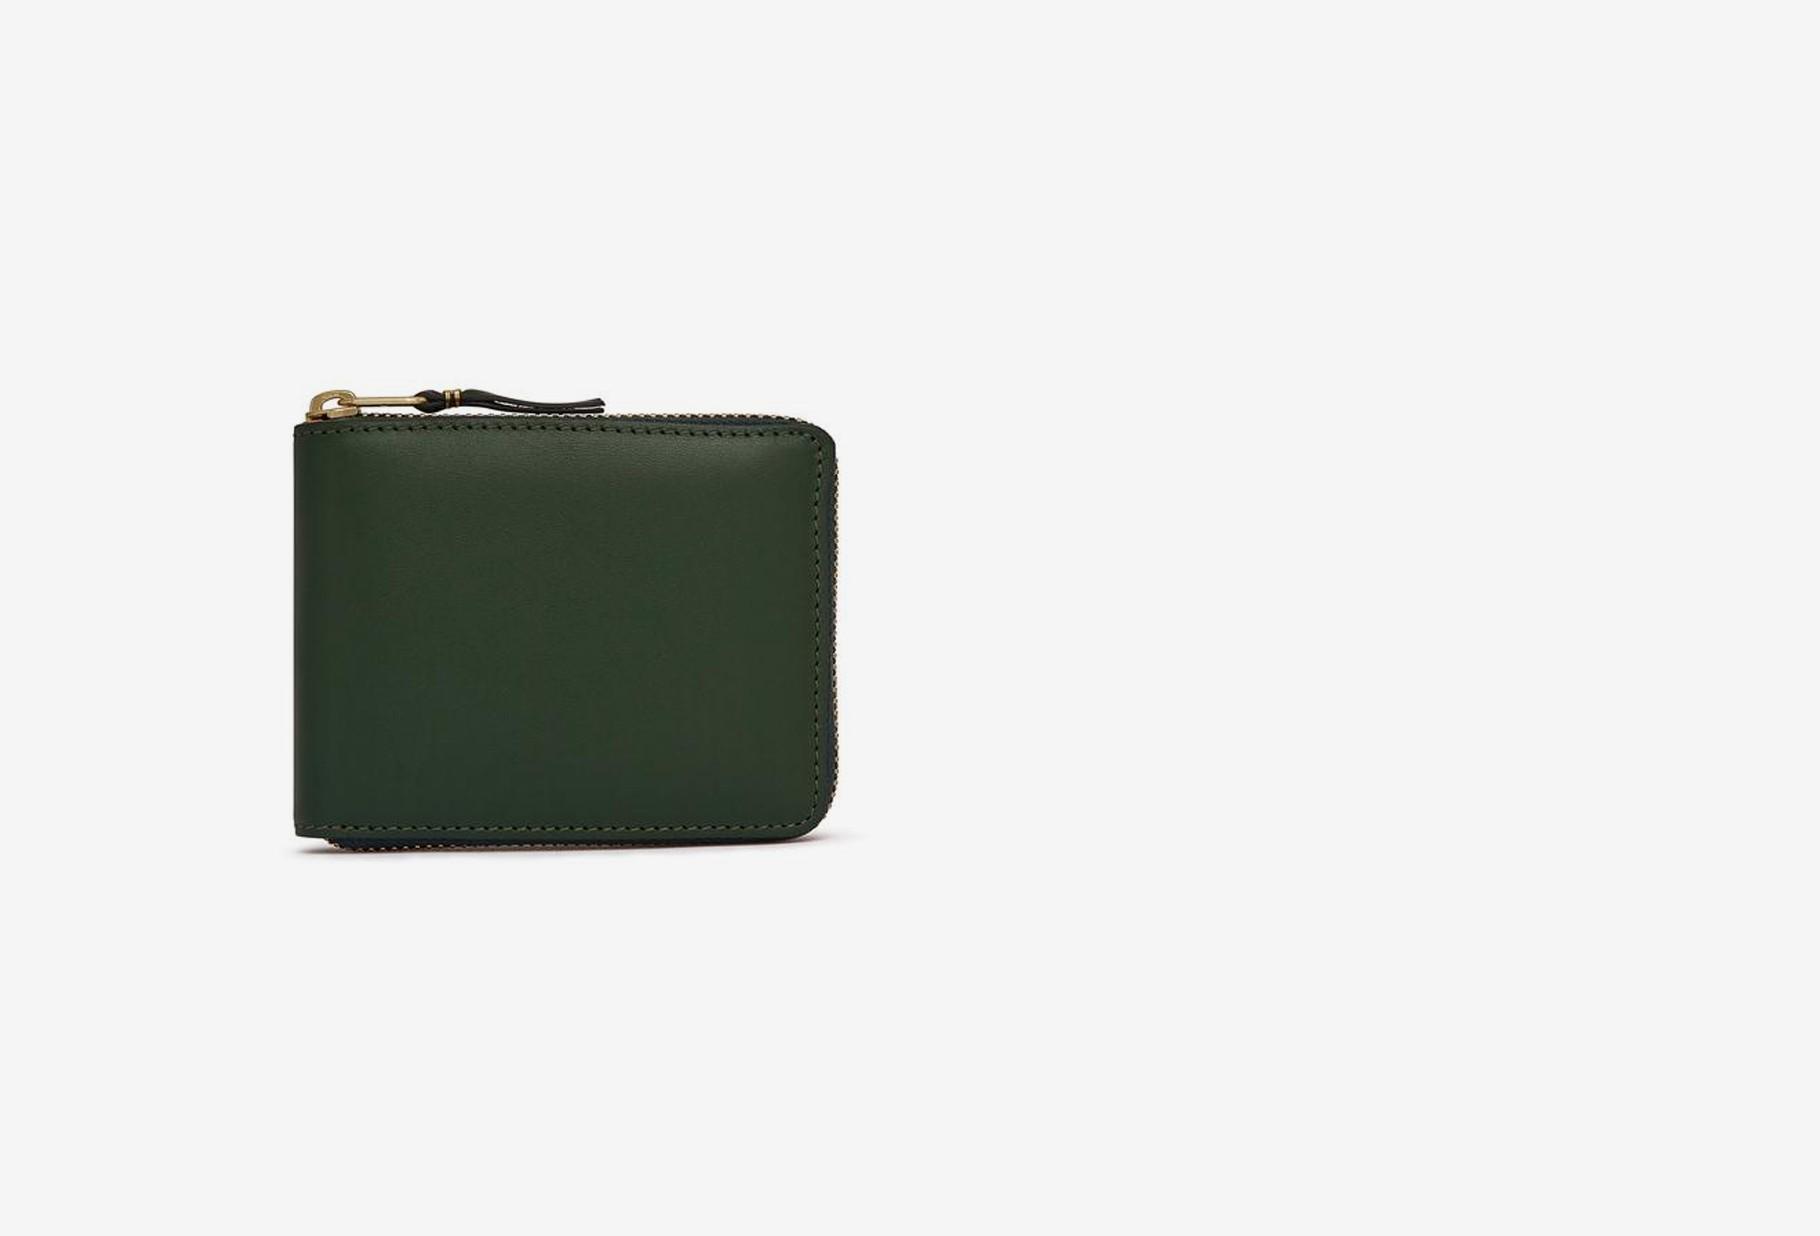 COMME DES GARÇONS WALLETS / Cdg leather wallet classic Sa7100 bottle green